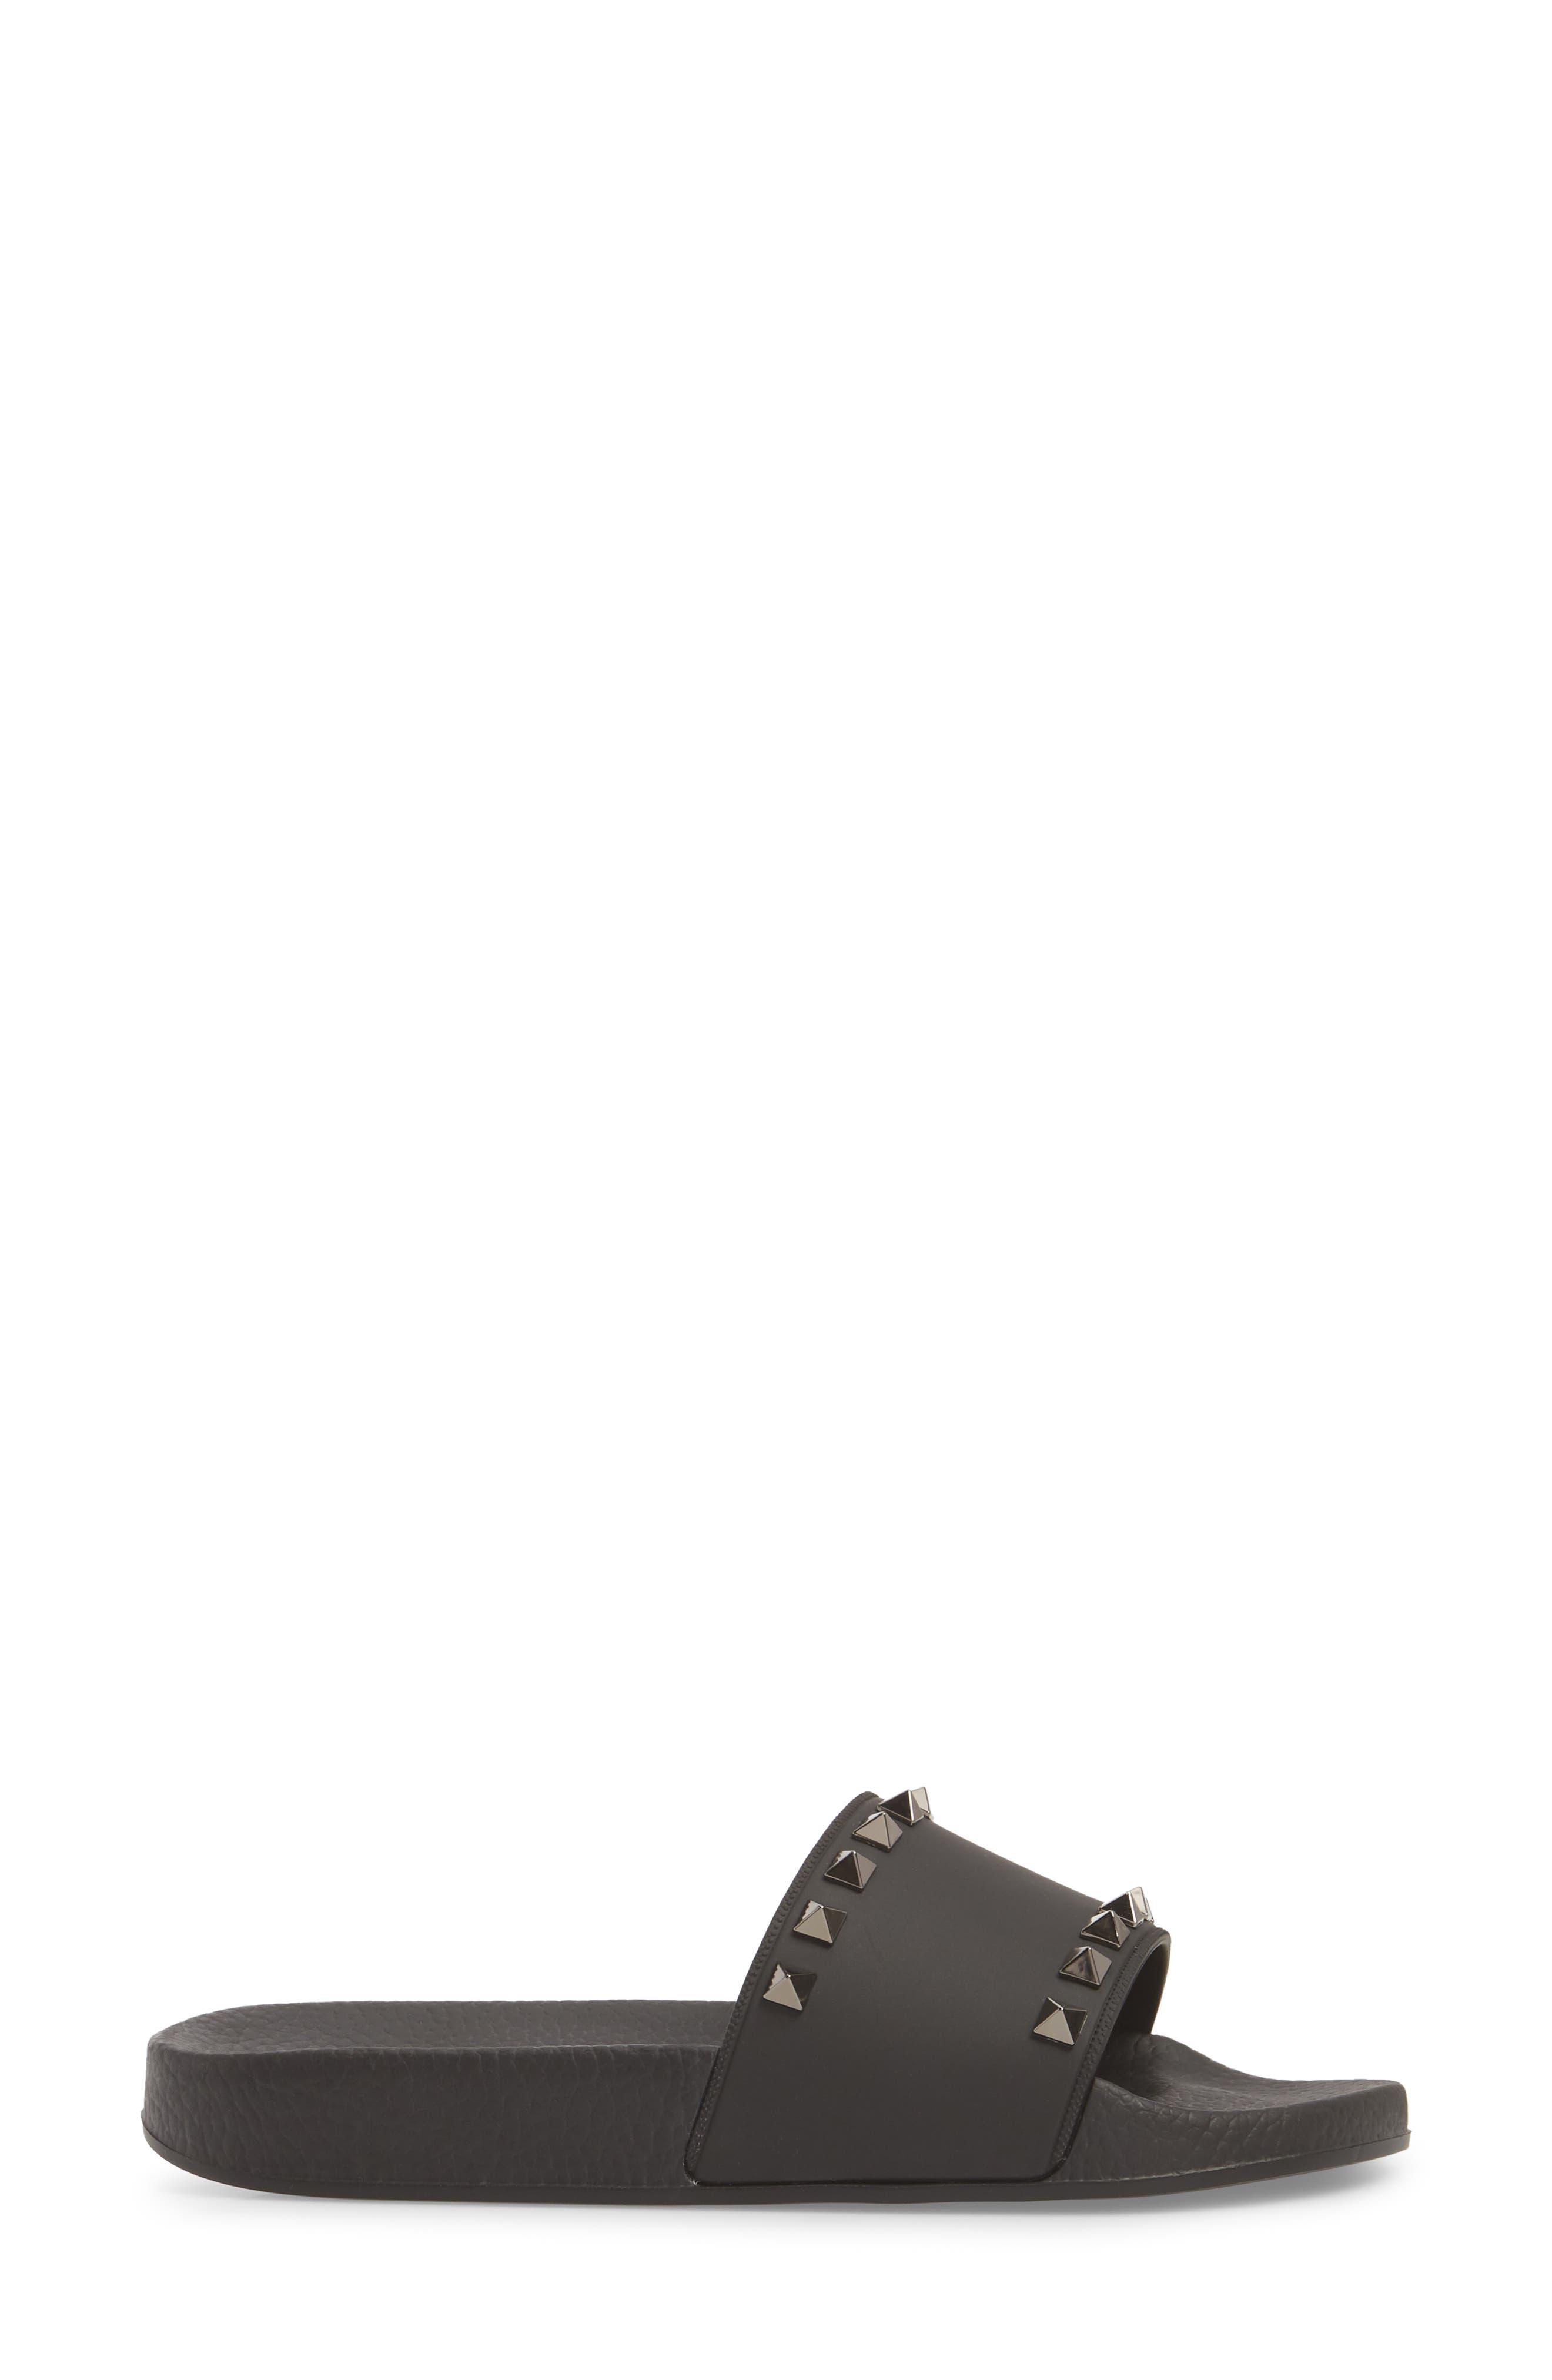 Rockstud Slide Sandal,                             Alternate thumbnail 3, color,                             Nero/ Nero